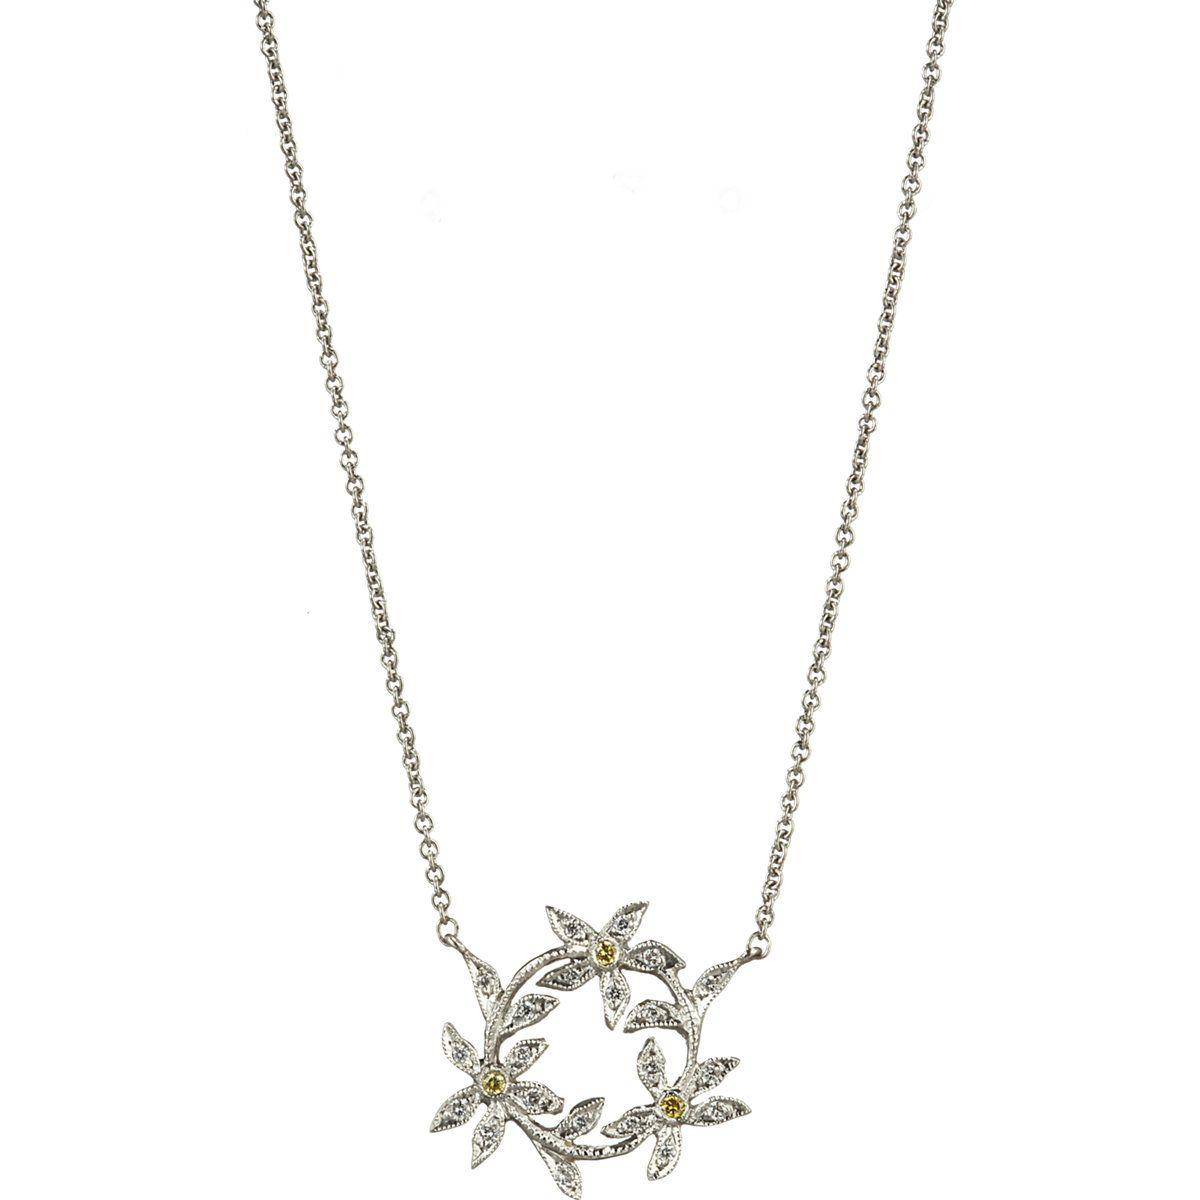 Diamond circle of flowers pendant necklace accessories